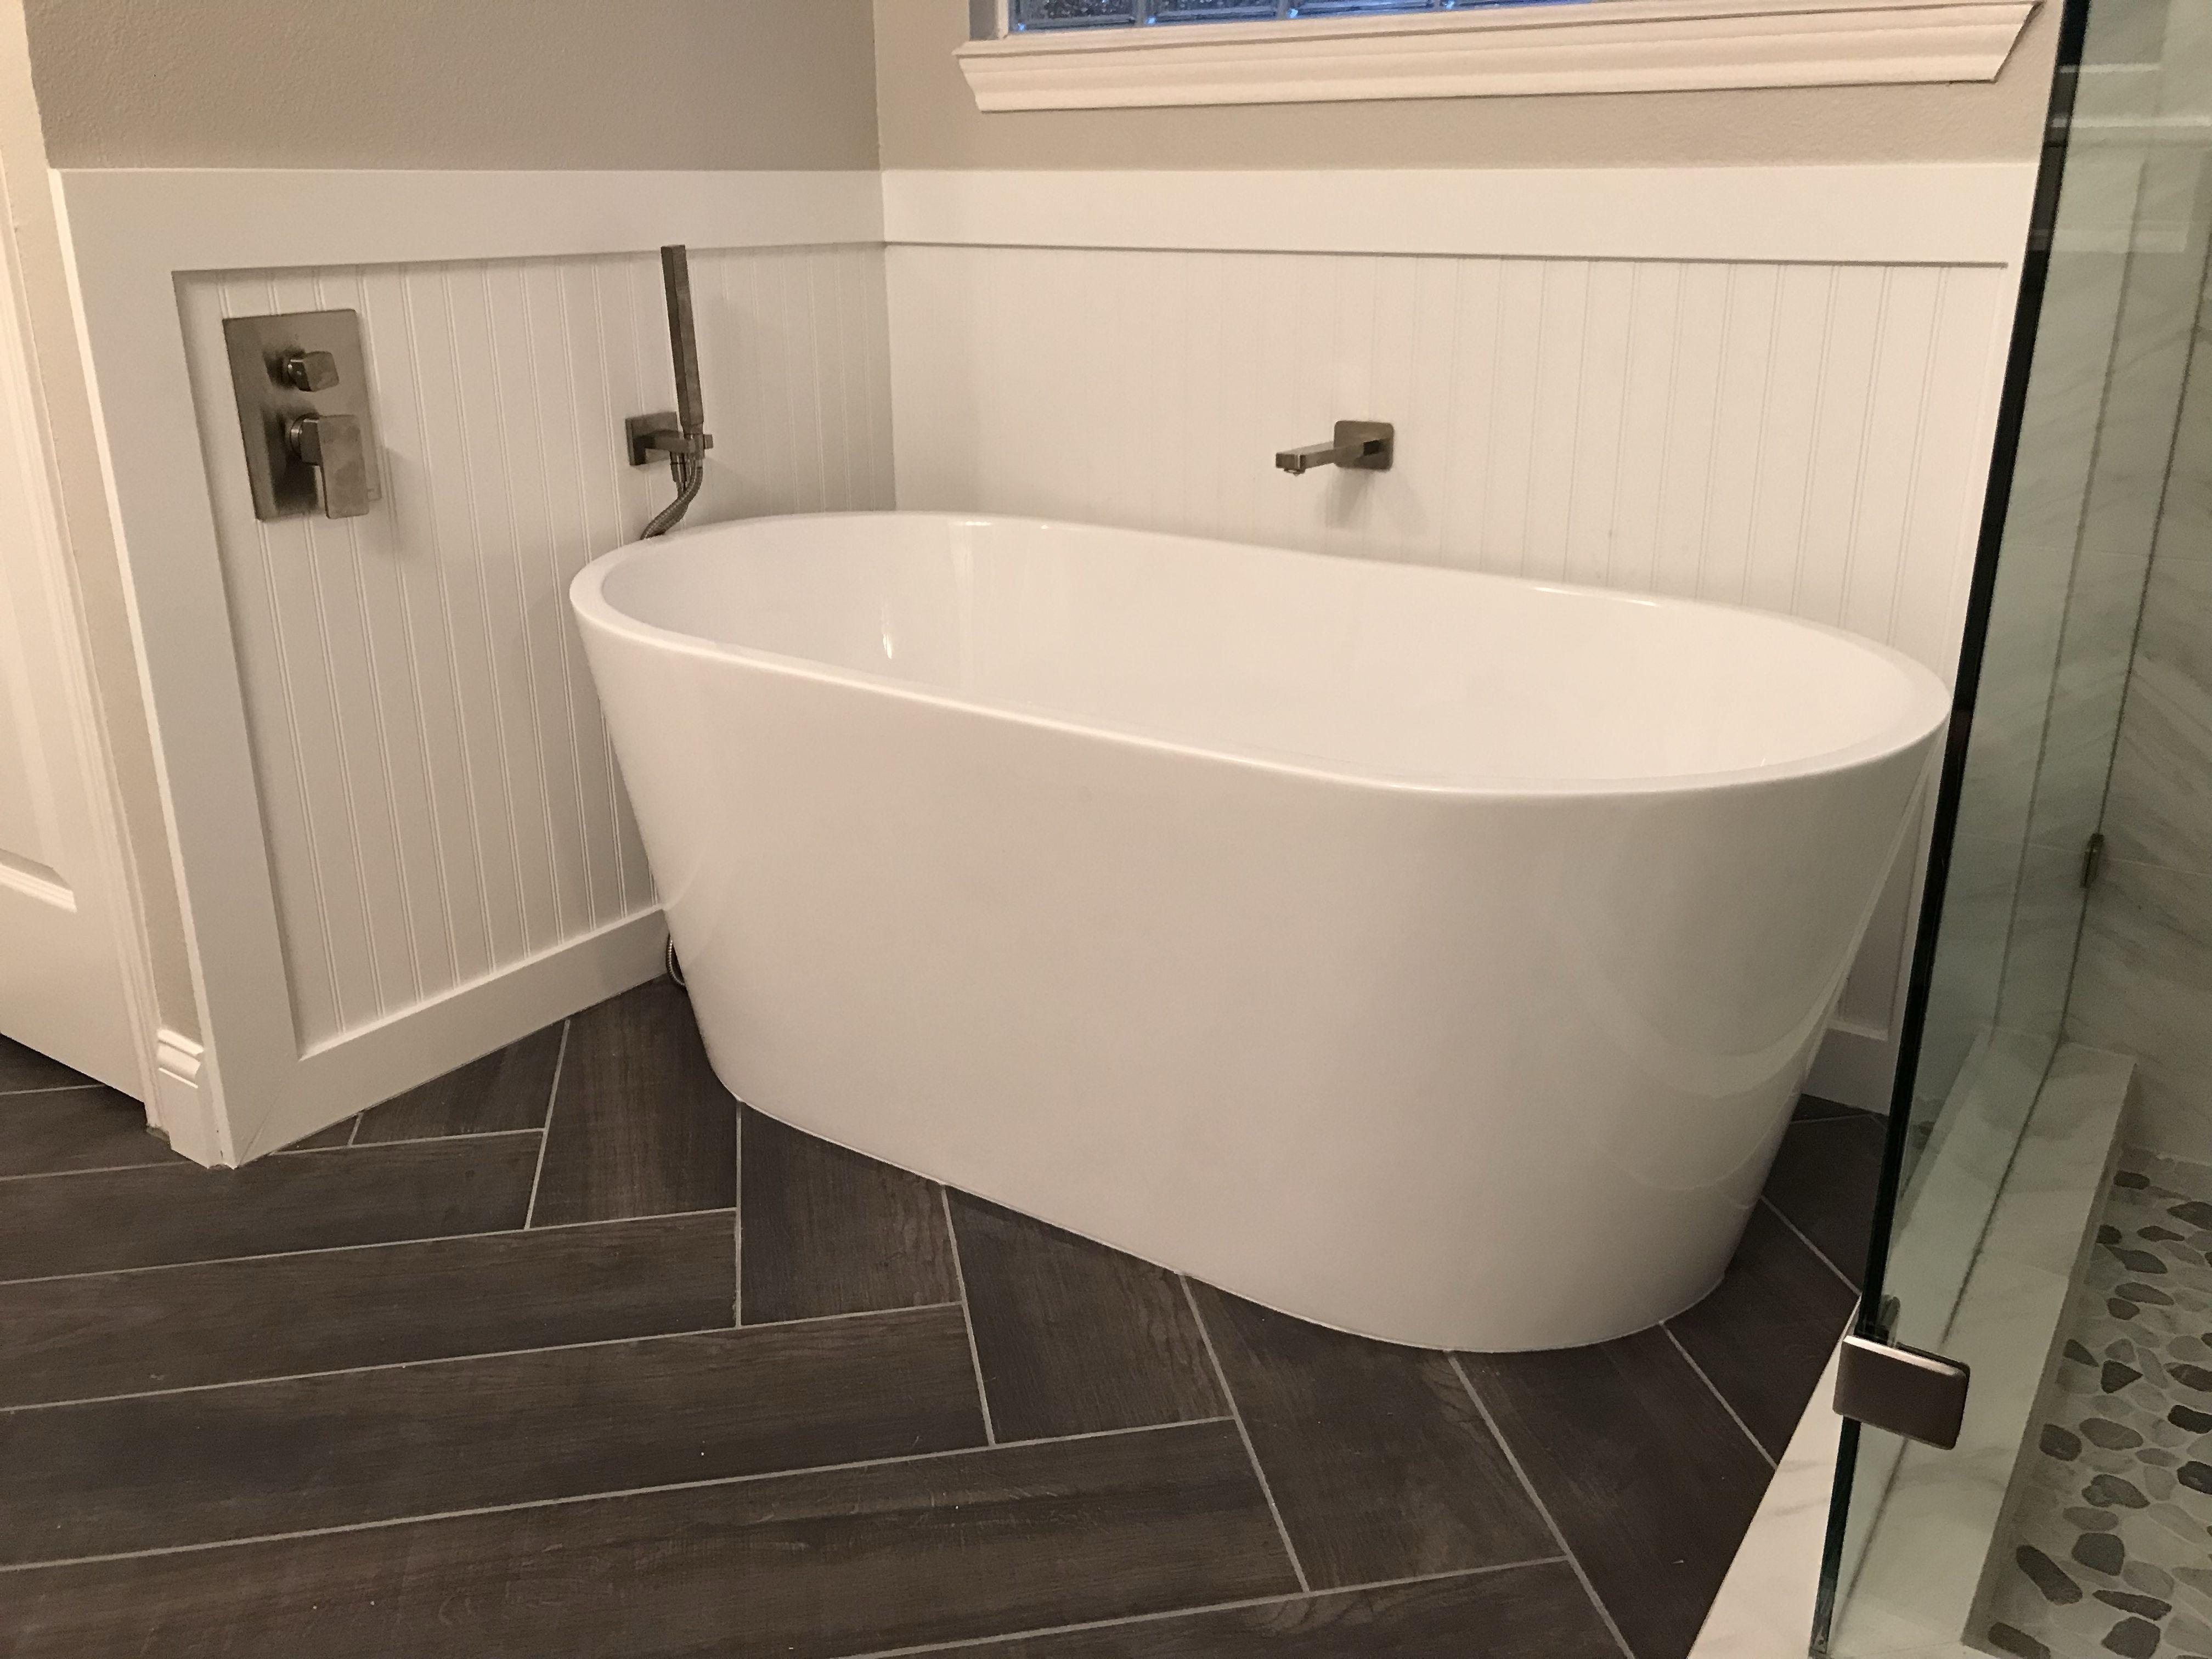 59 free standing tub free standing